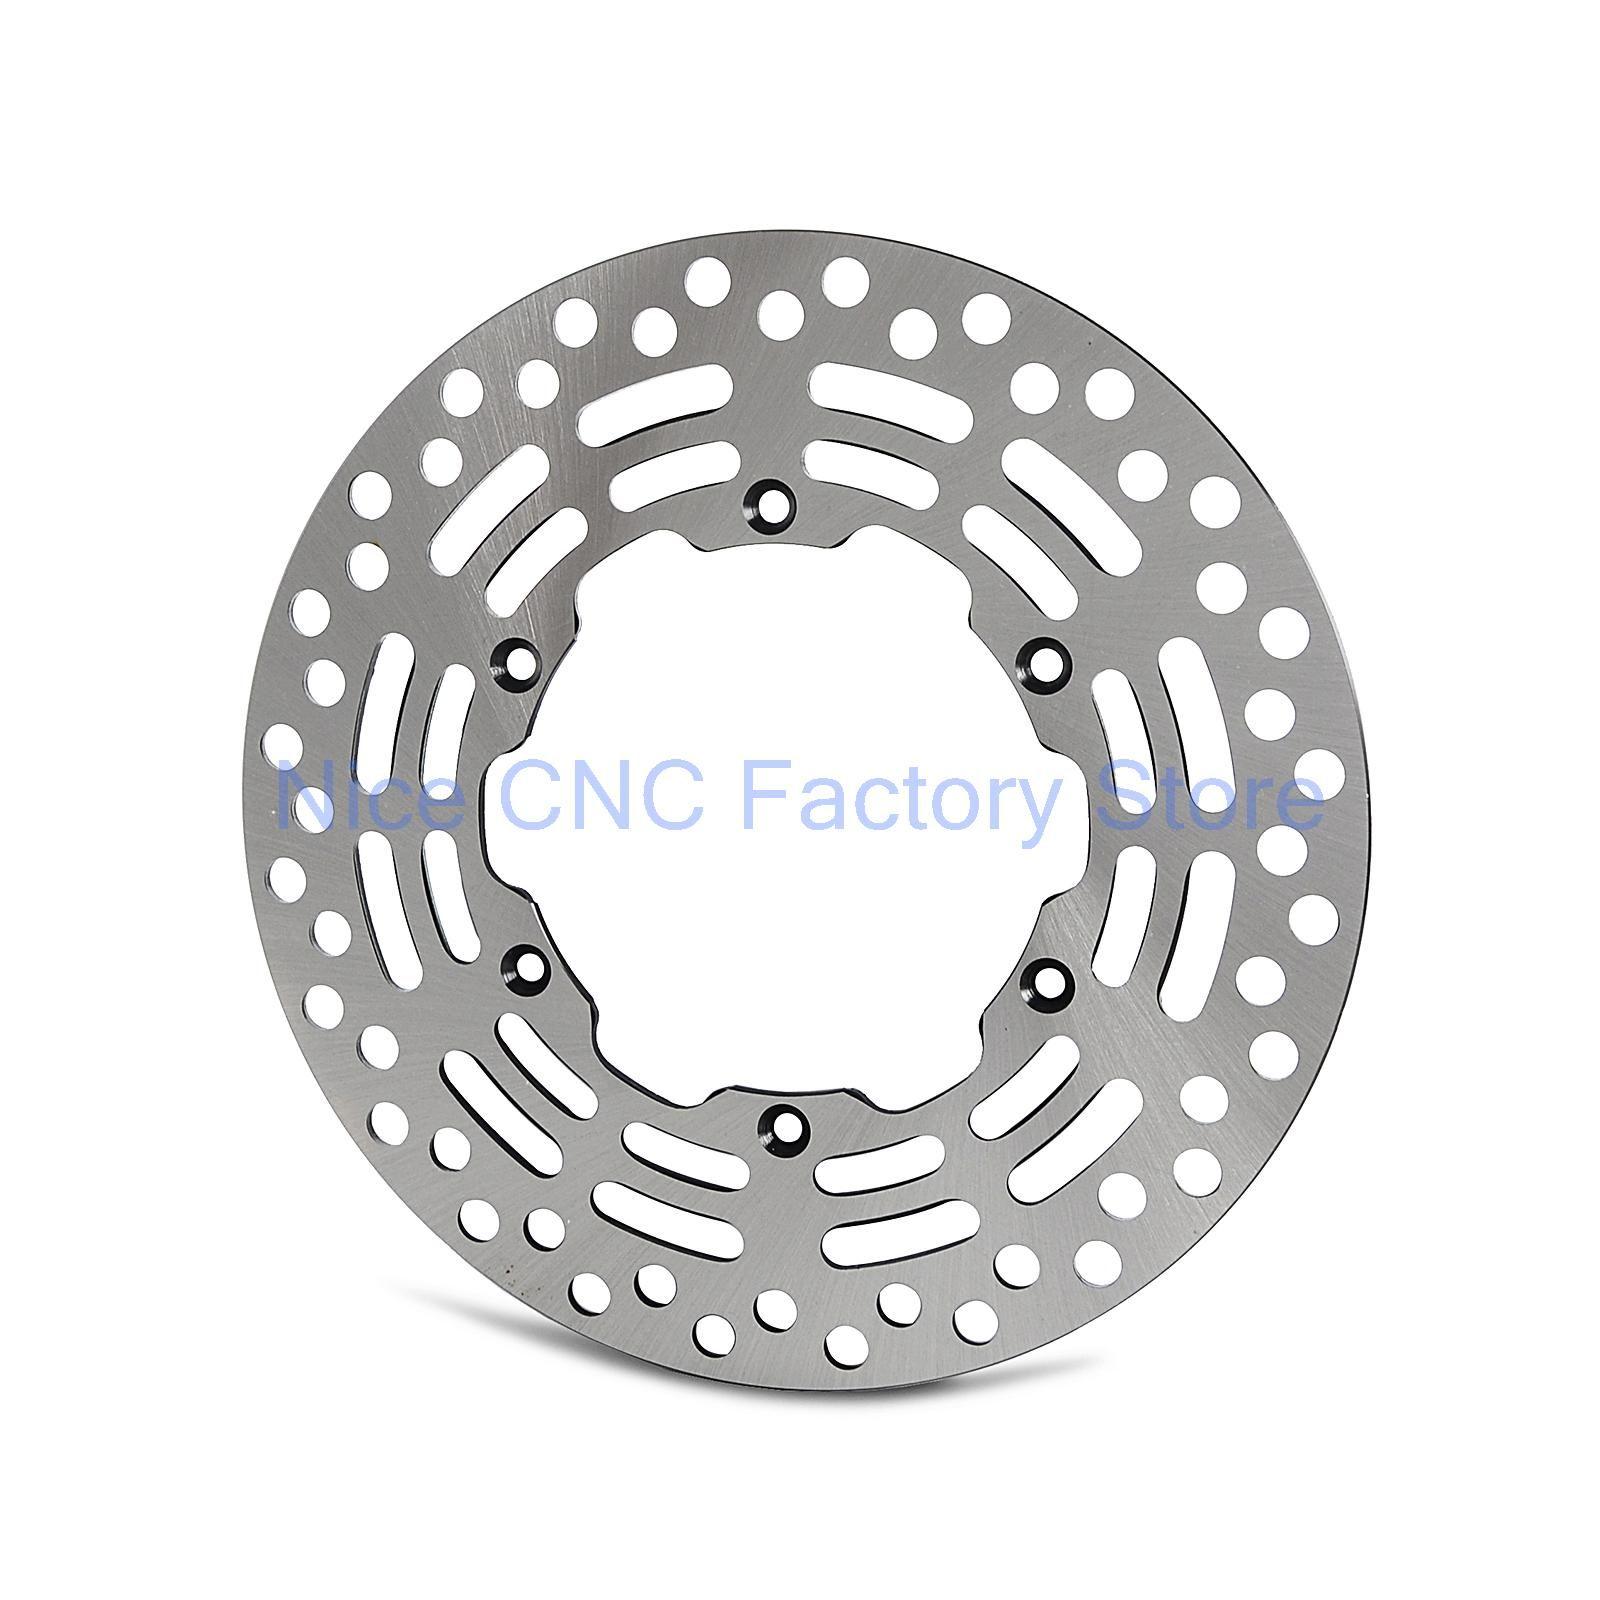 Front Brake Disc Rotor For Suzuki RM125 RM250 88-10 DR-Z250 01-07 DR-Z400 00-09 DR-Z 250 400 RMX250 89-99 Kawasaki KLX400 03-06